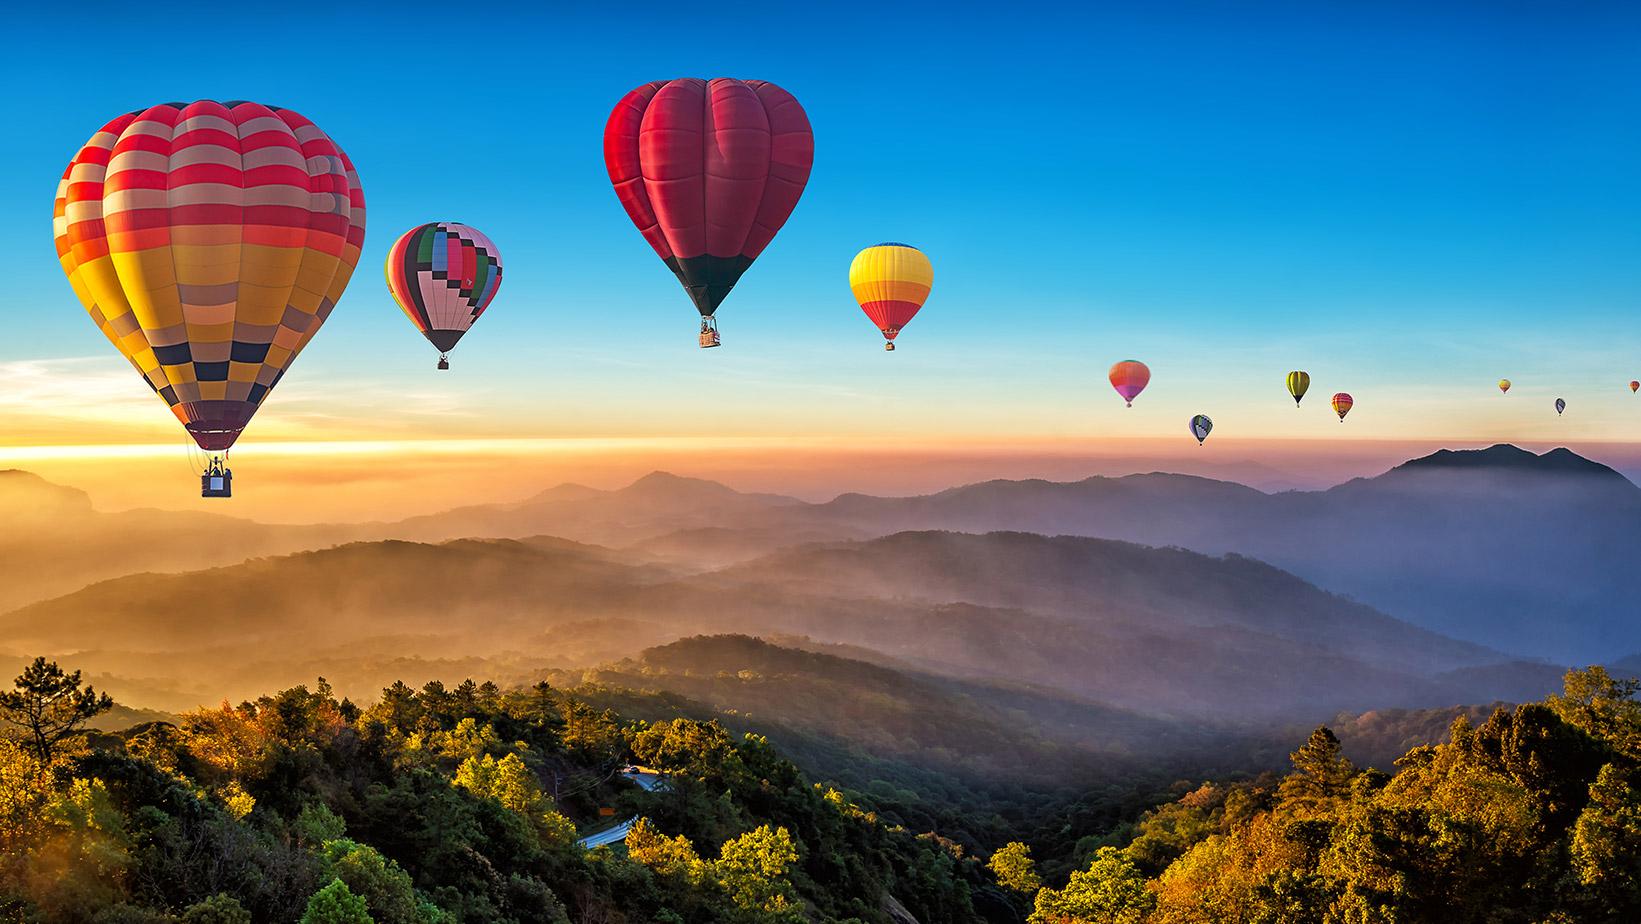 balloons flying over mountain range